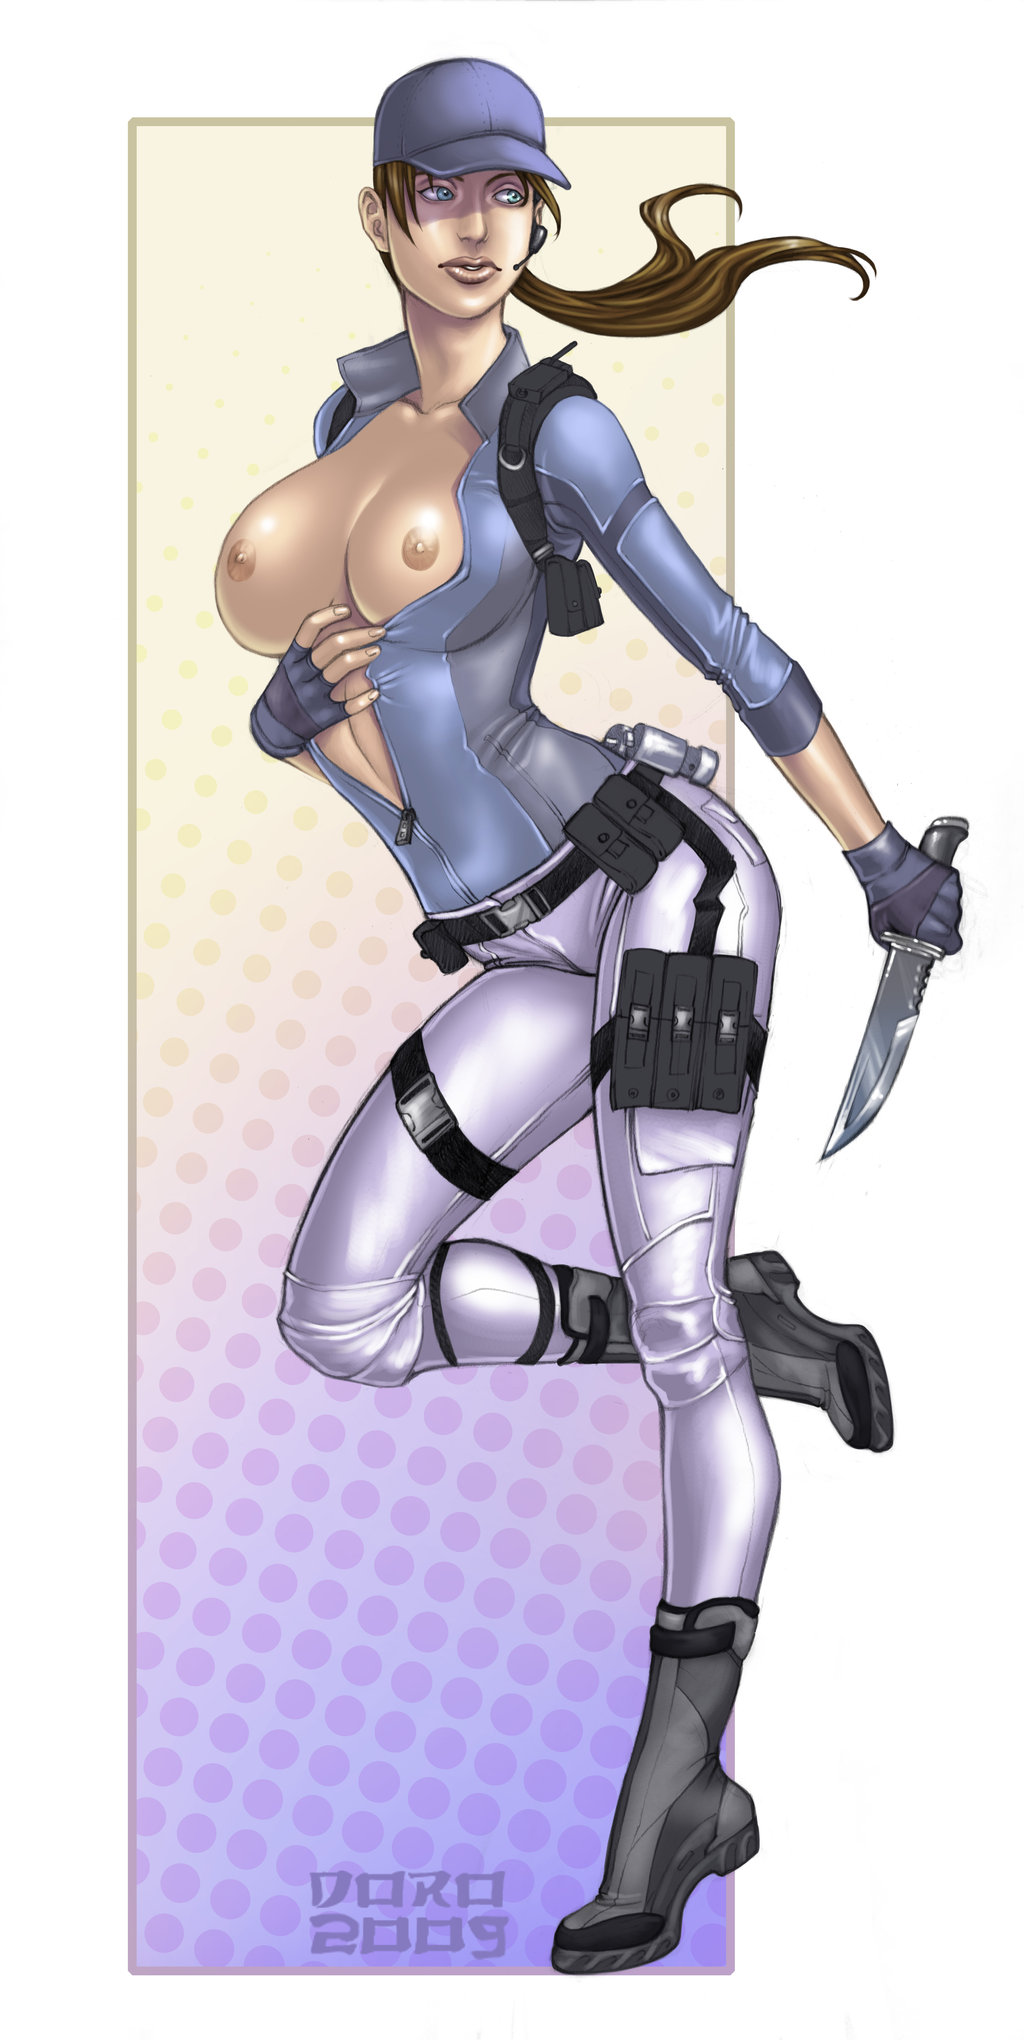 Resident evil artwork porn free hentai scenes